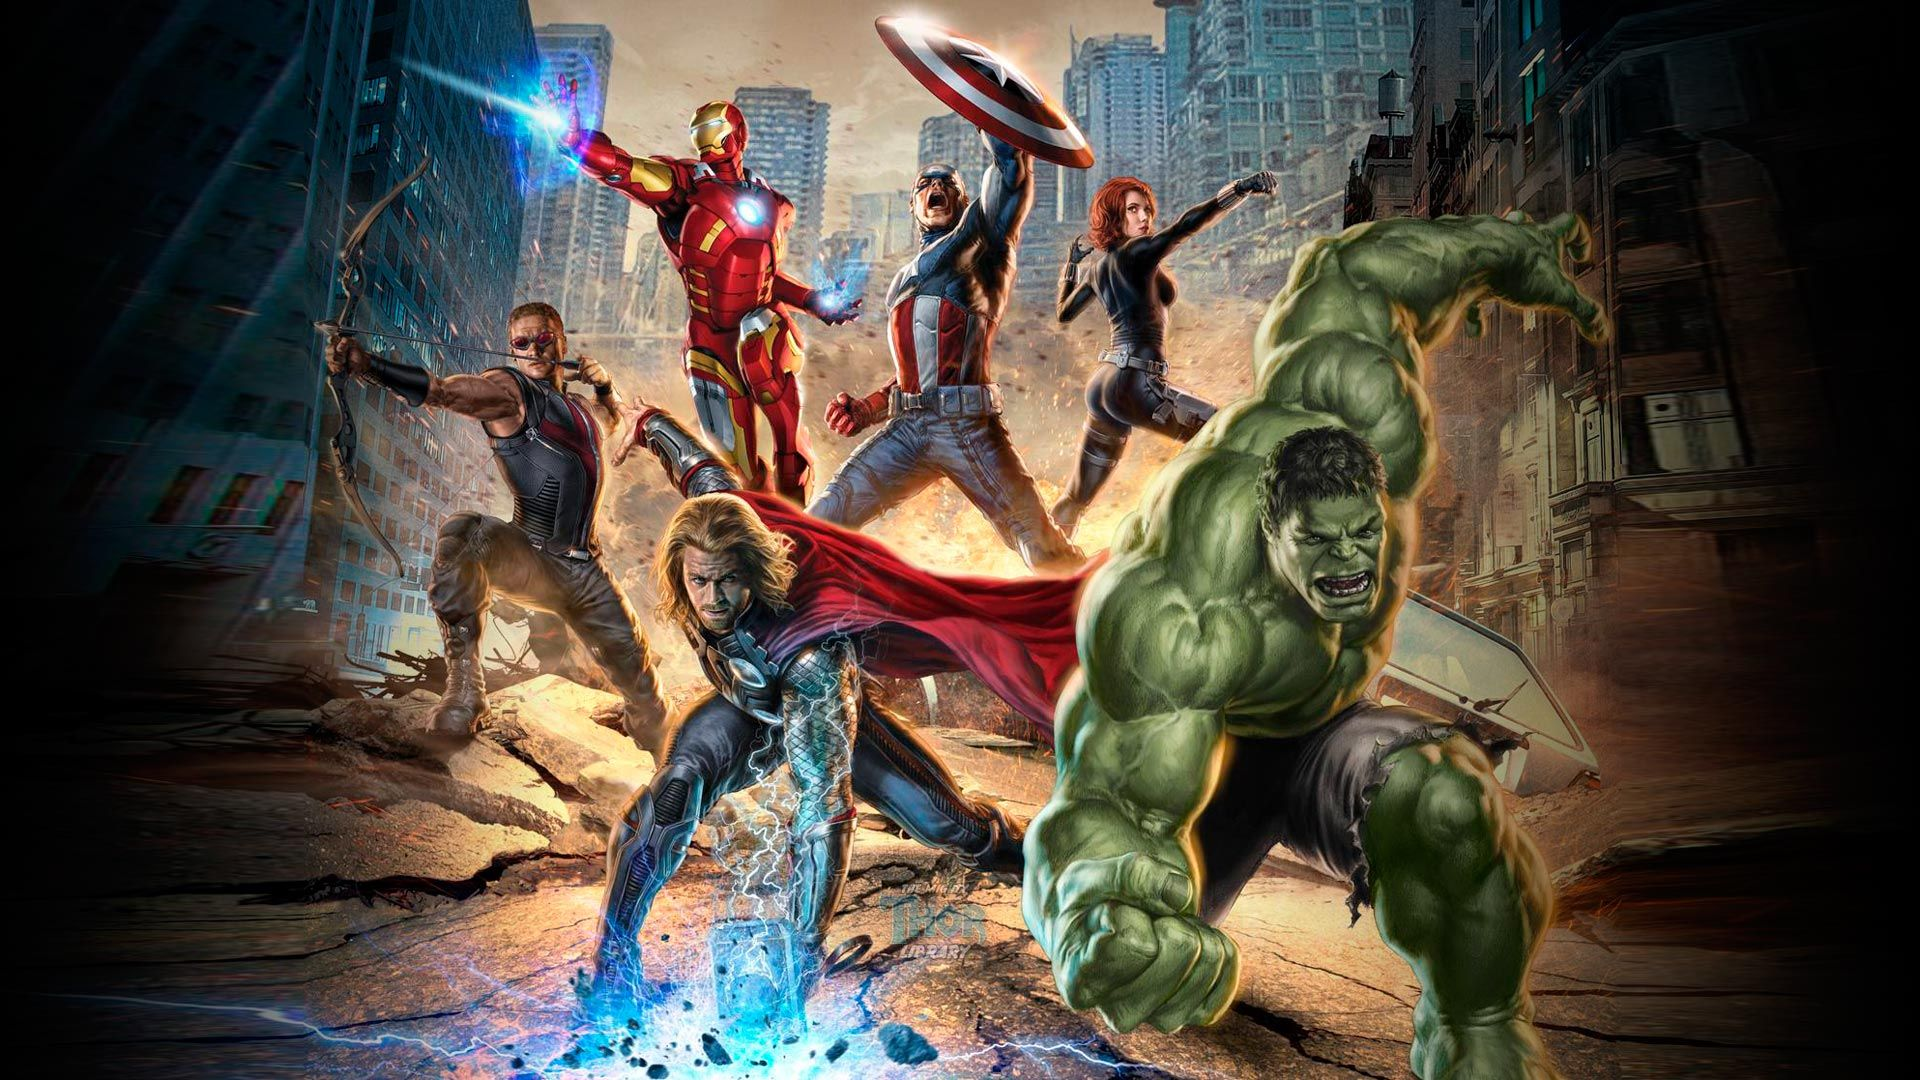 Avengers 2 Background 4k Hd Background Wallpaper 35 Avengers Poster Avengers Movie Posters Avengers Wallpaper